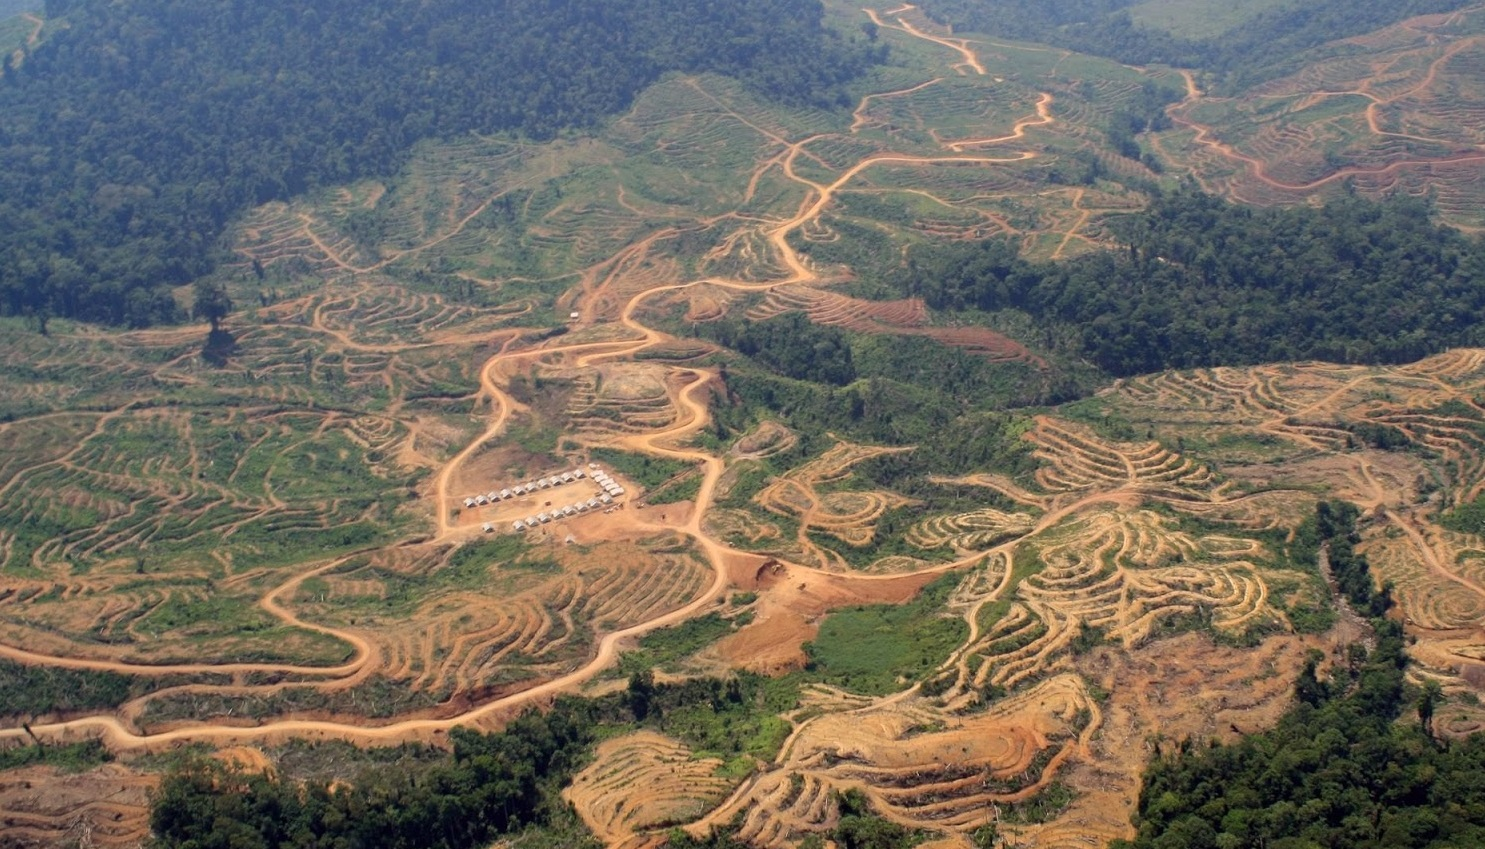 KLHK Sebut 91 Persen Hutan yang Lepas Terjadi Sebelum Era Jokowi, Benarkah Begitu?